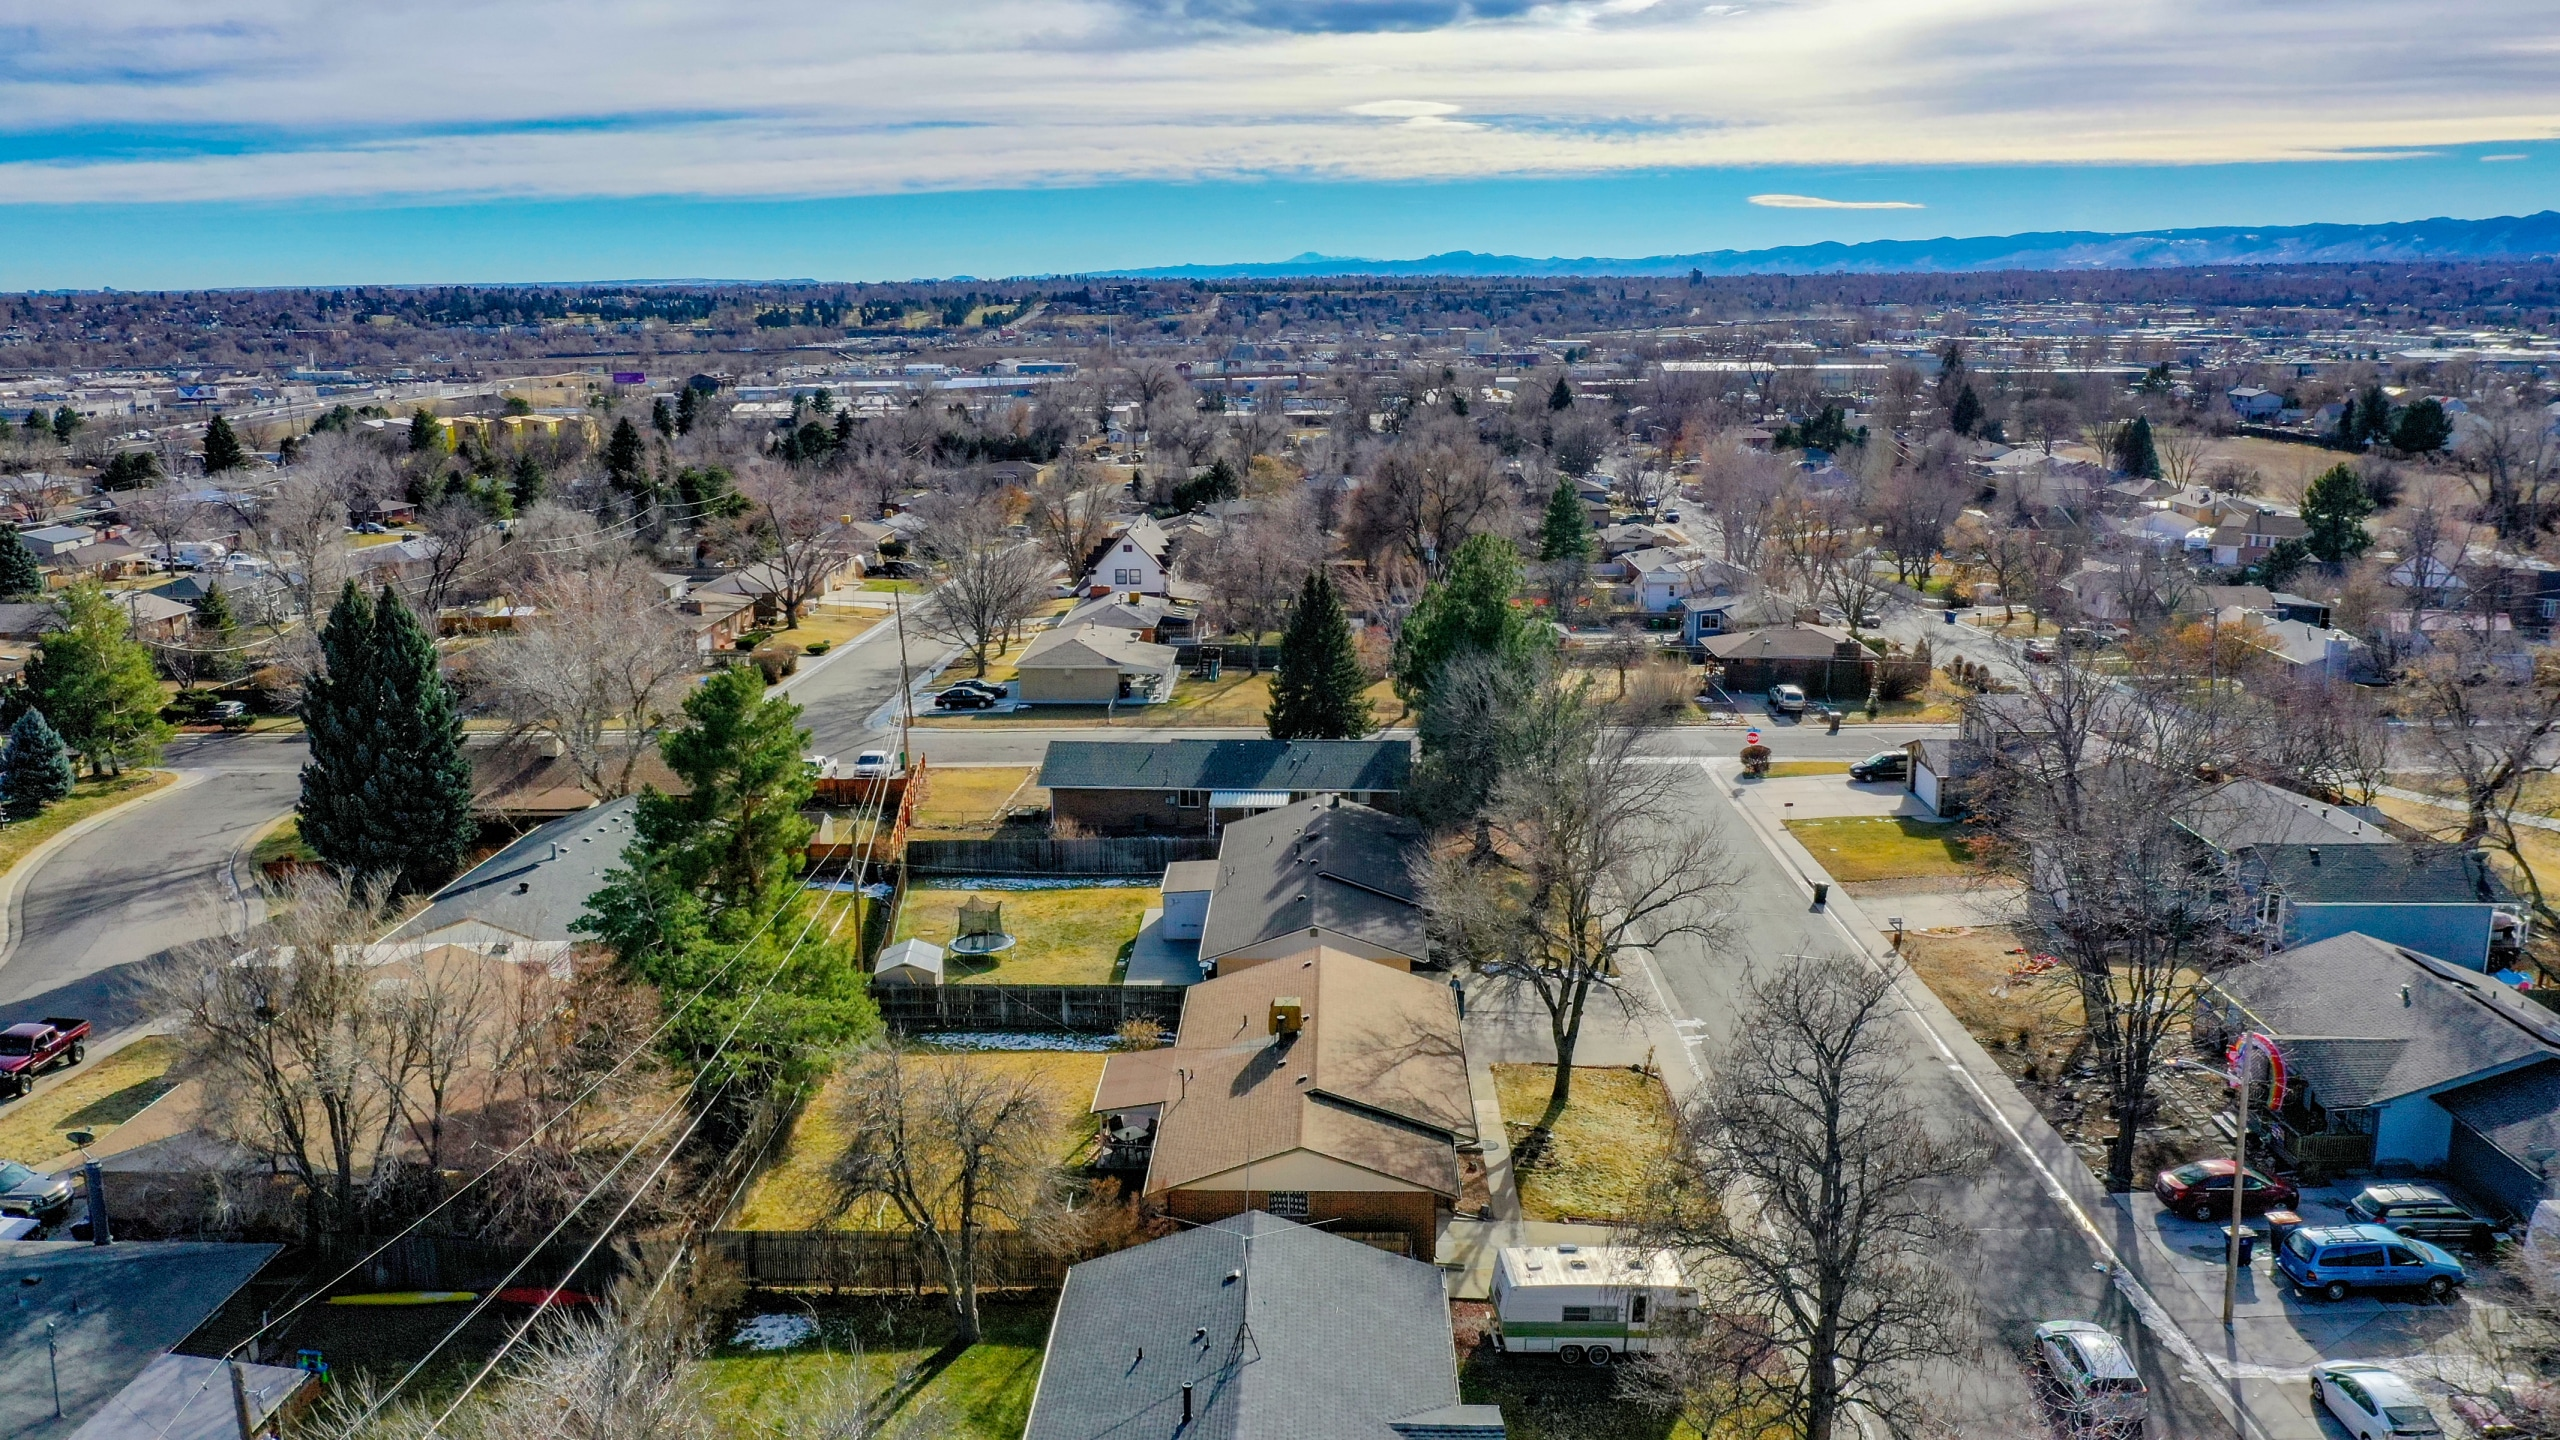 Mountain View, Drone Photo, Denver, Arvada, Skyline